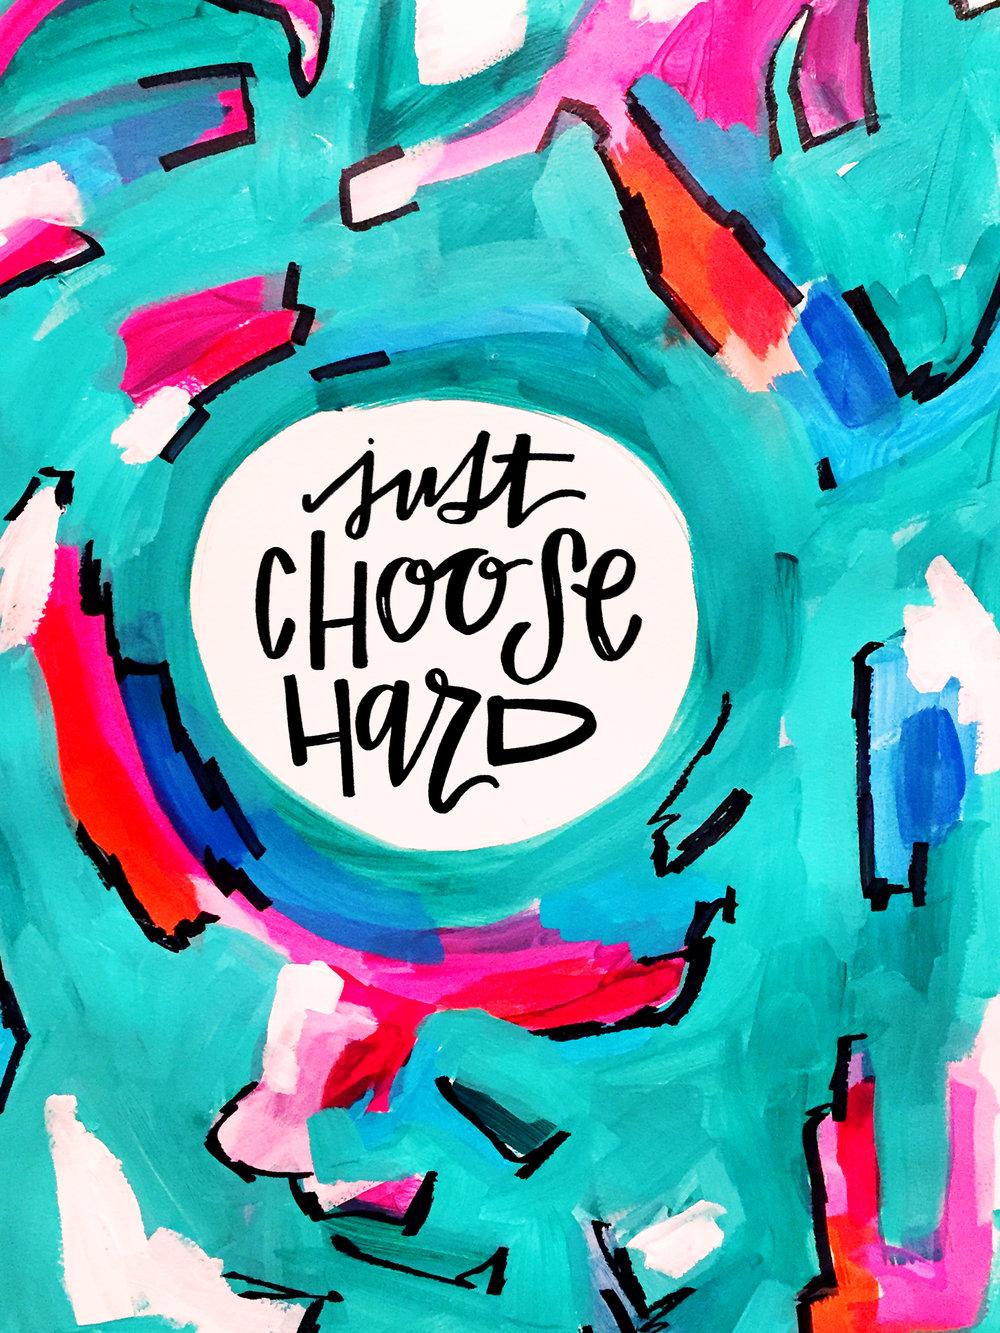 2/20/16: Choose